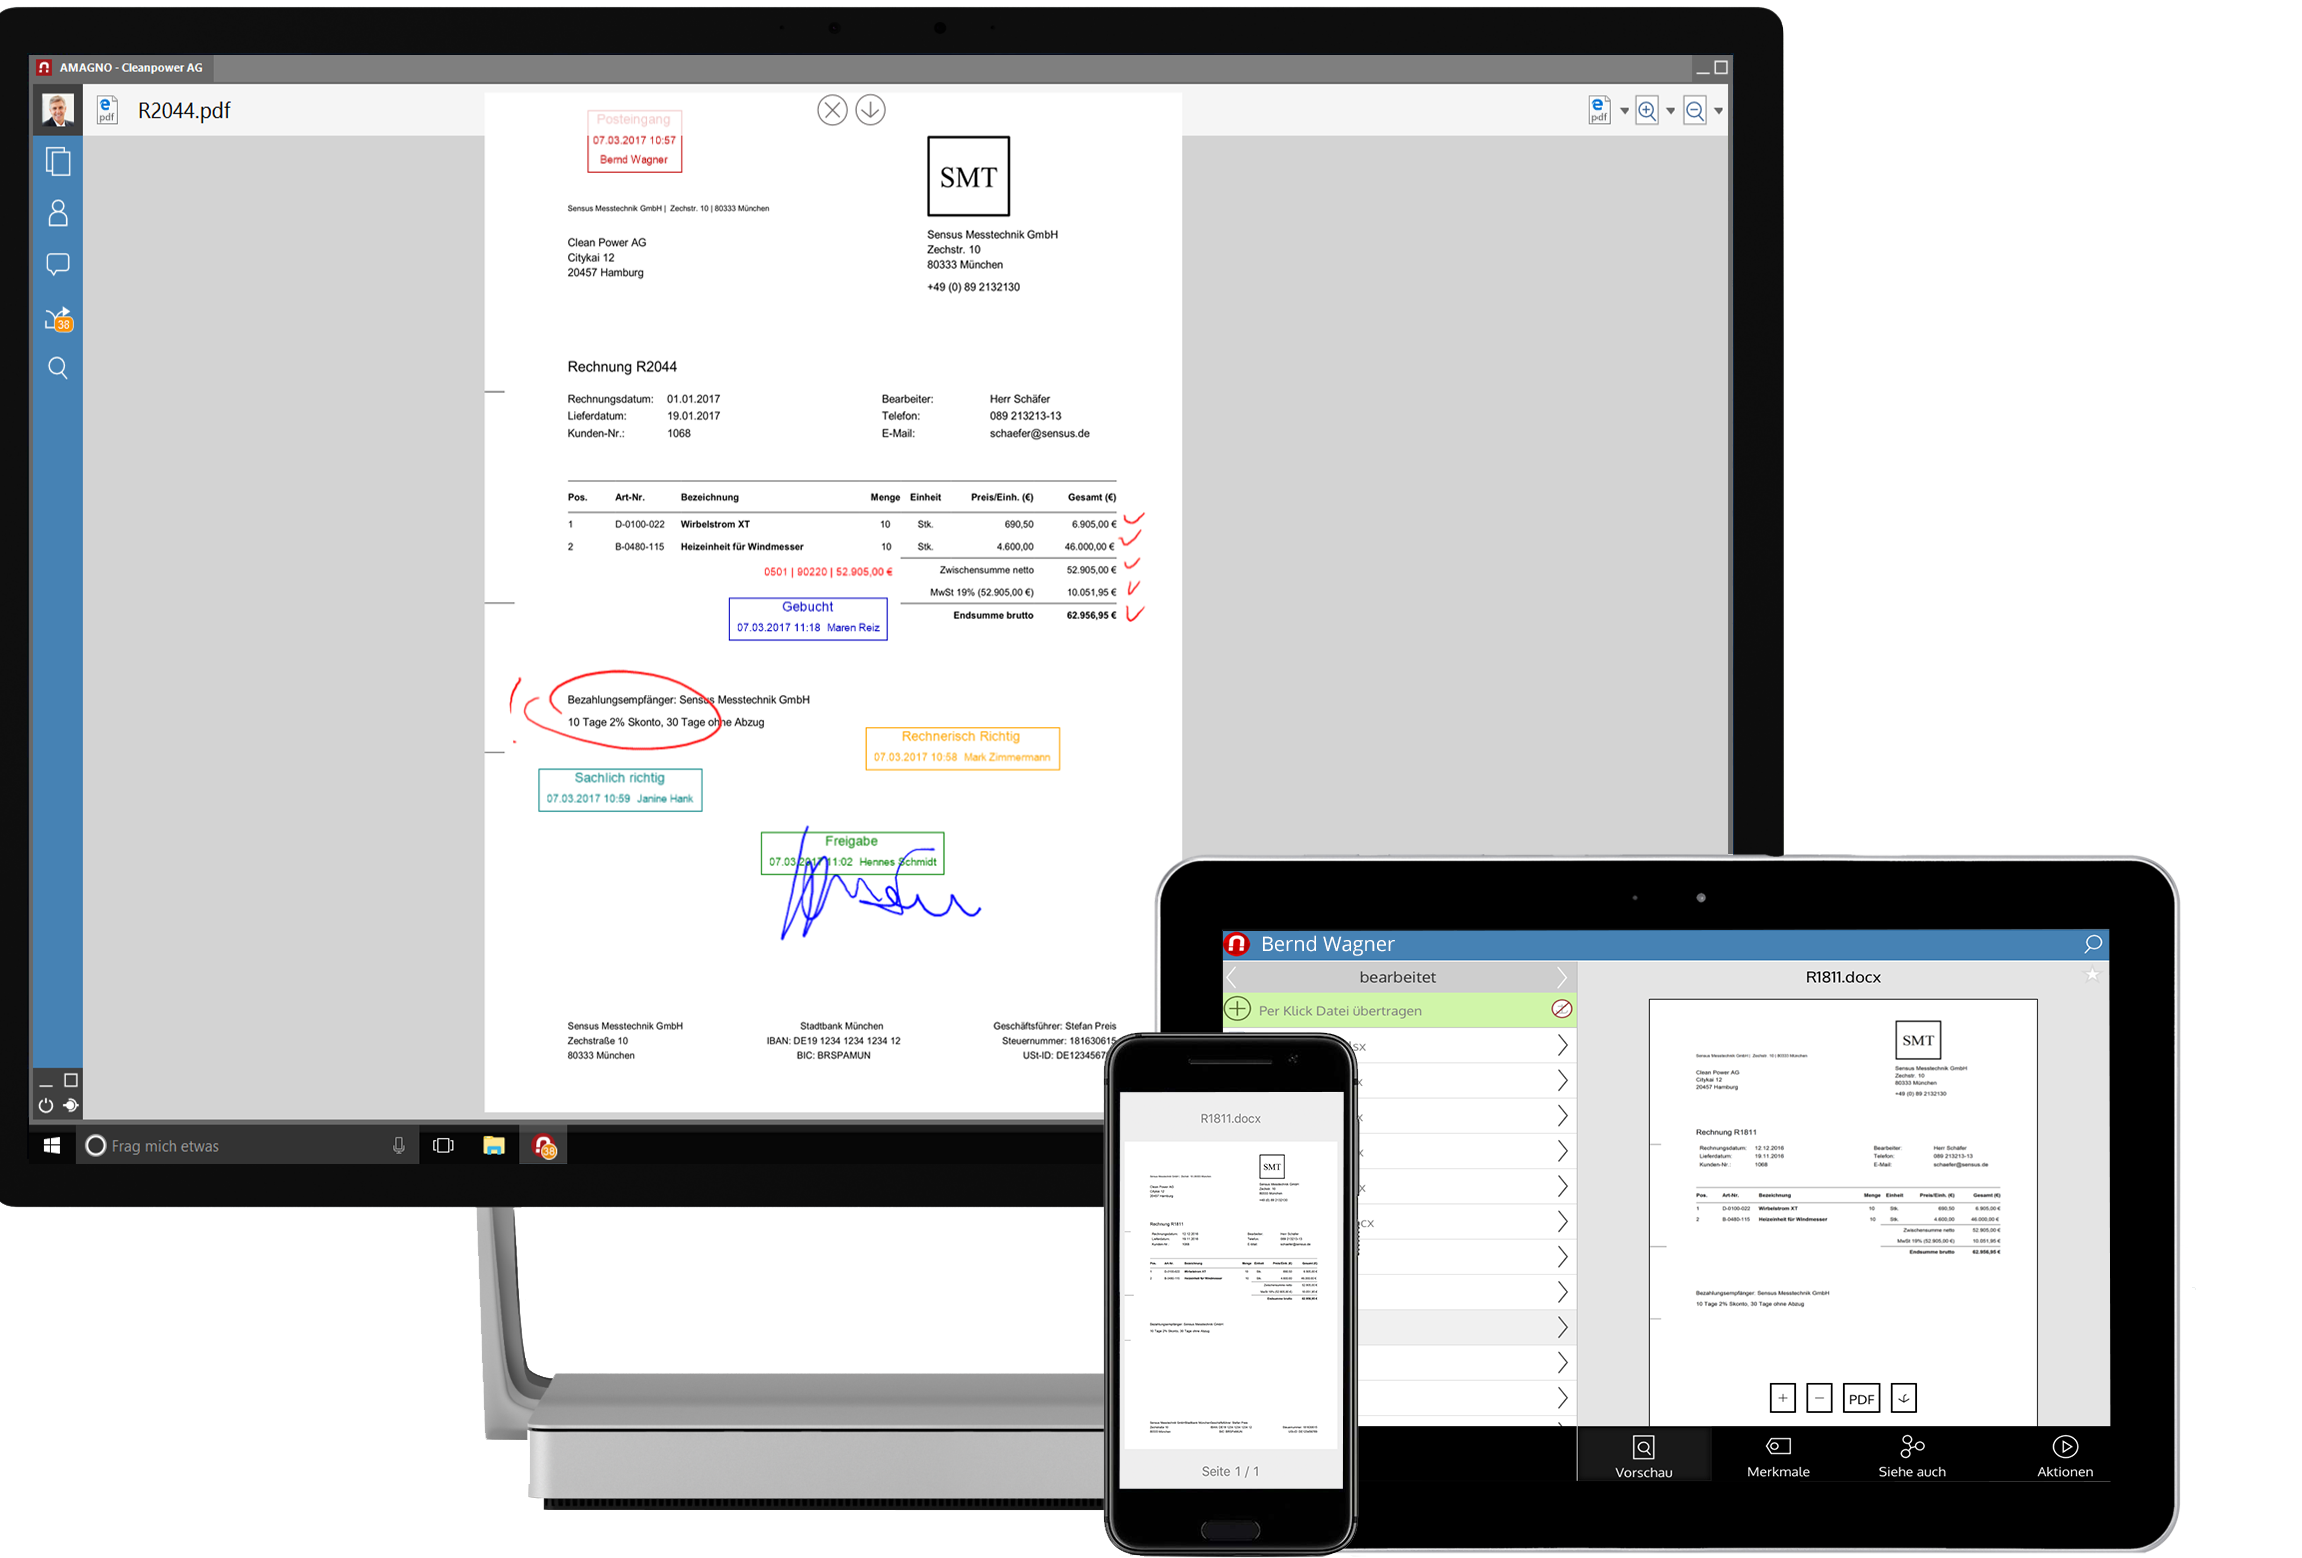 amagno 5 devices studio ipad smartphone  - AMAGNO Client